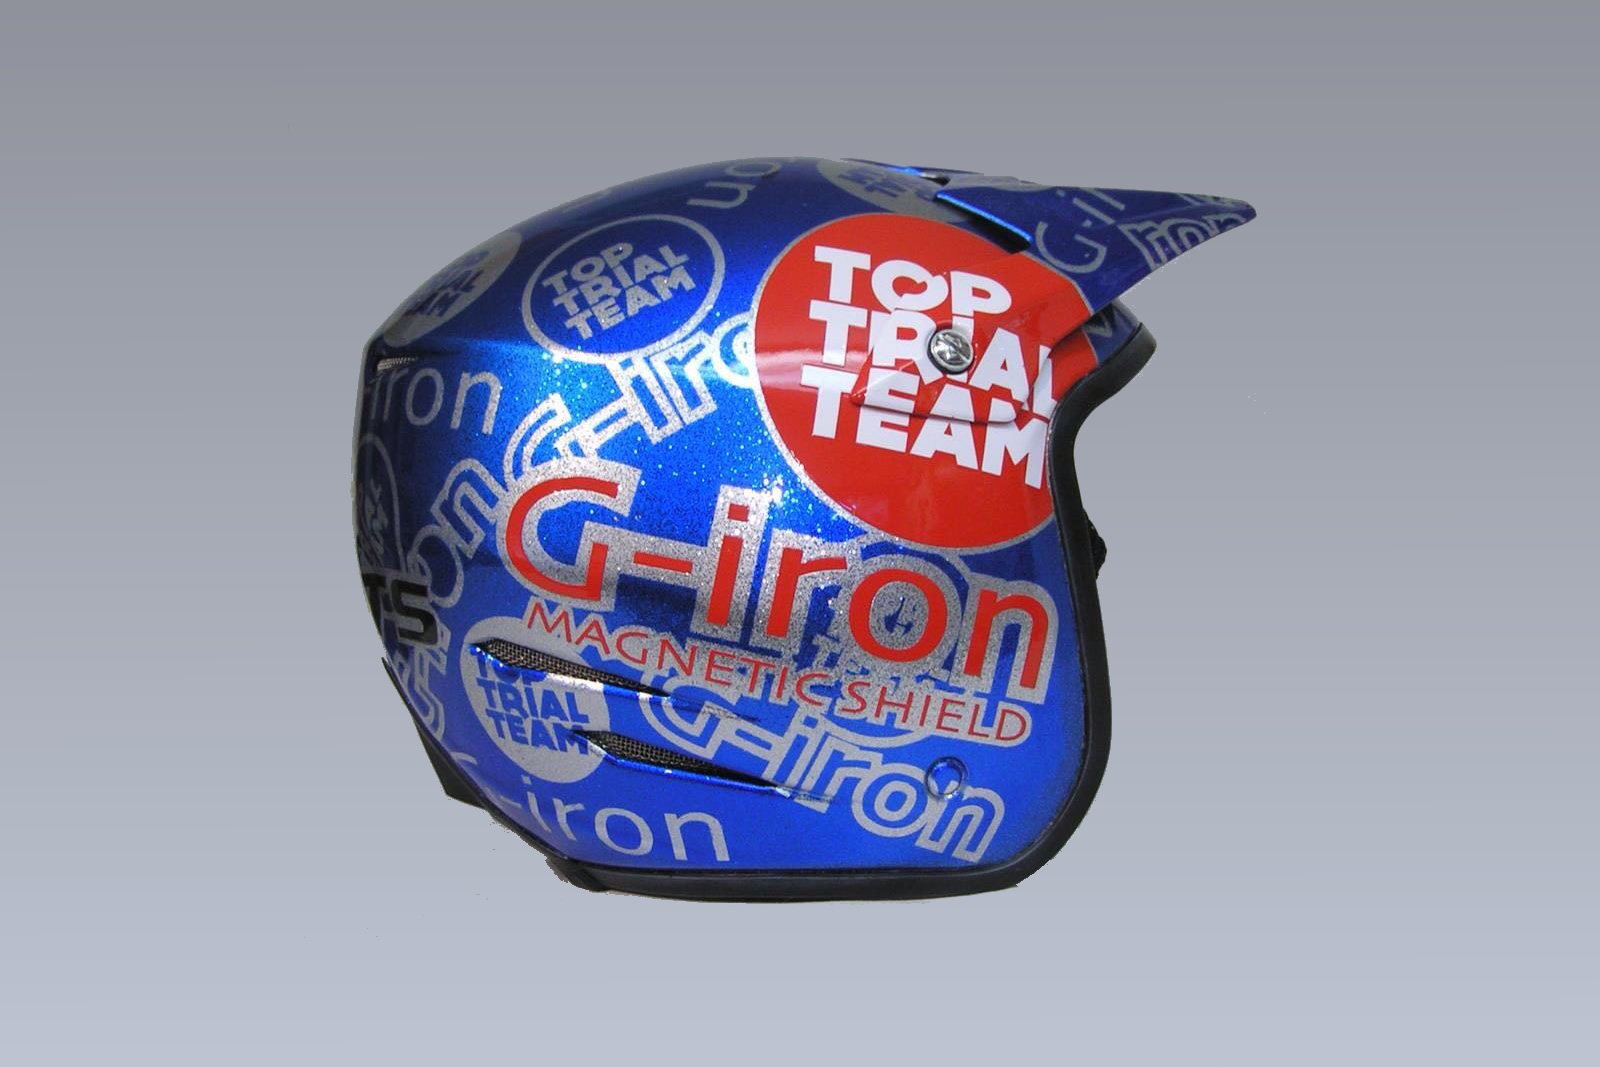 new top trial helmet